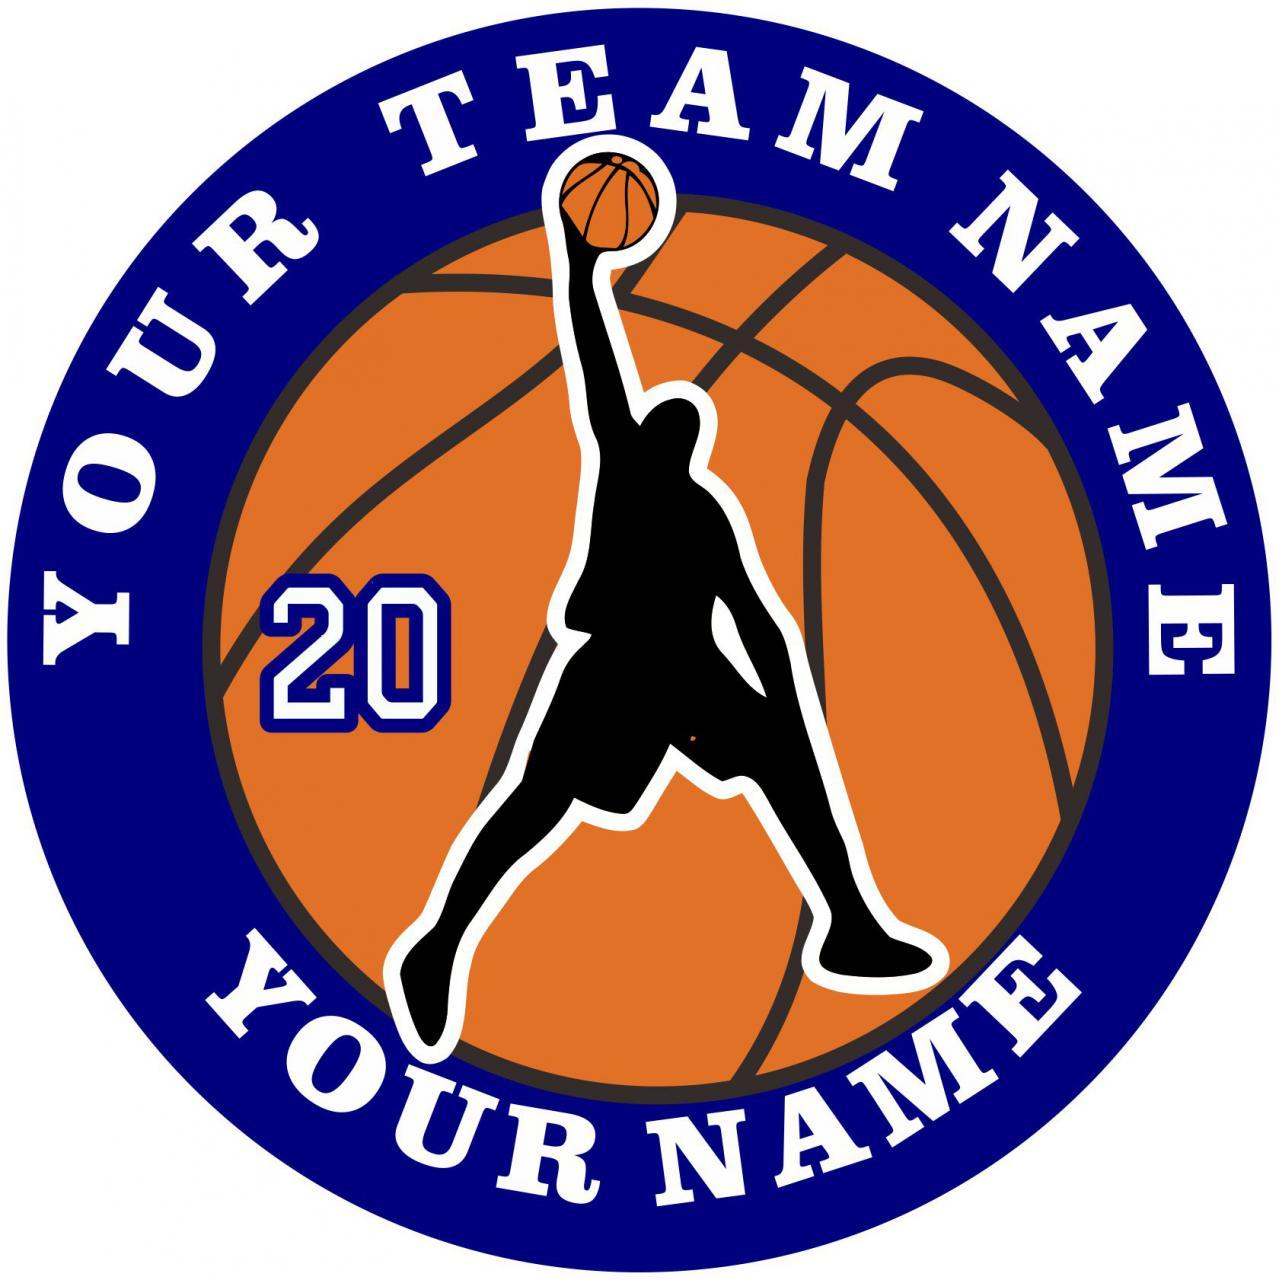 ... basketball logo the customized basketball logo is designed exactly as